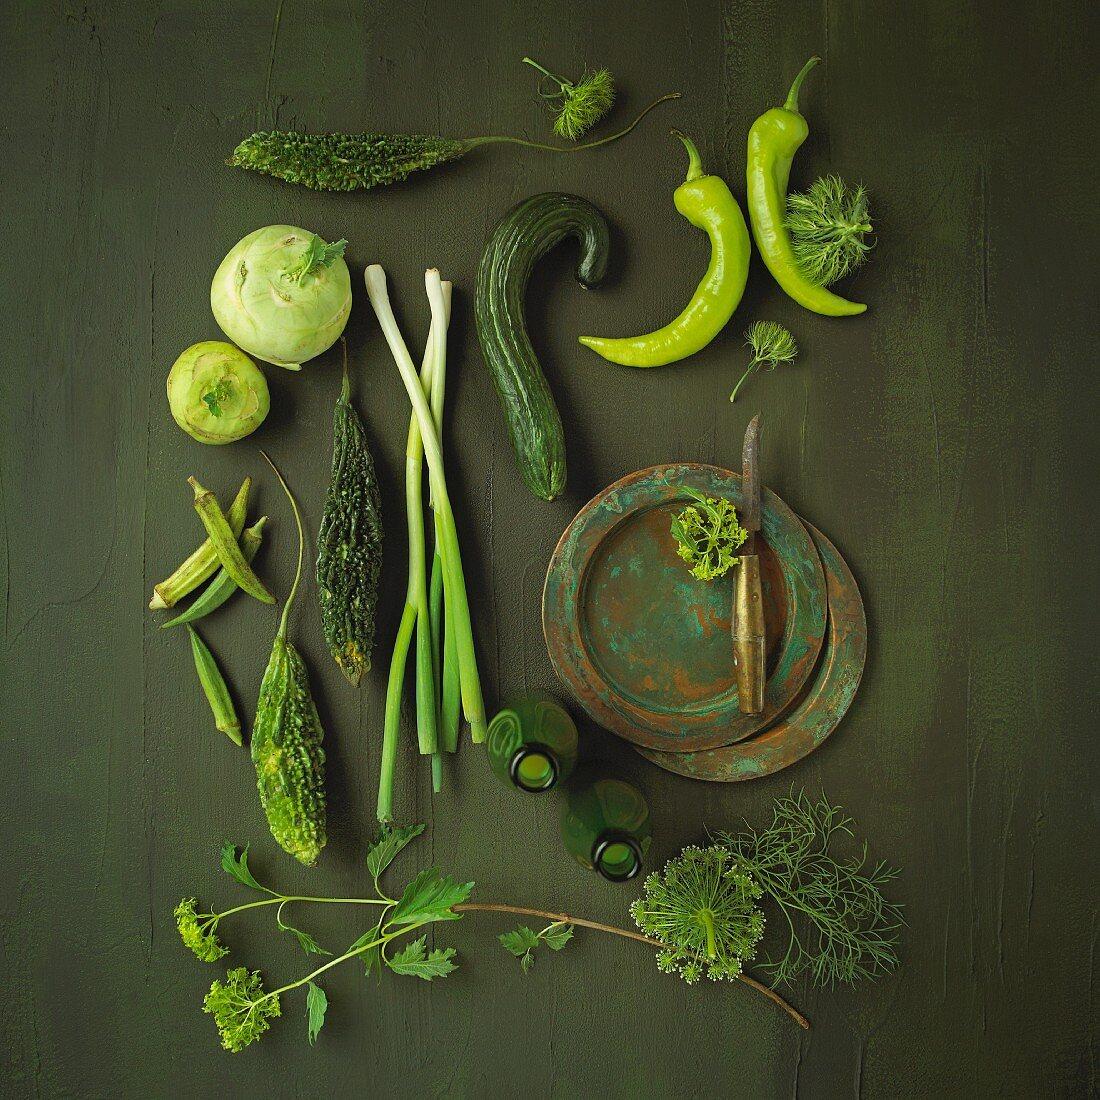 An arrangement of green vegetables and herbs